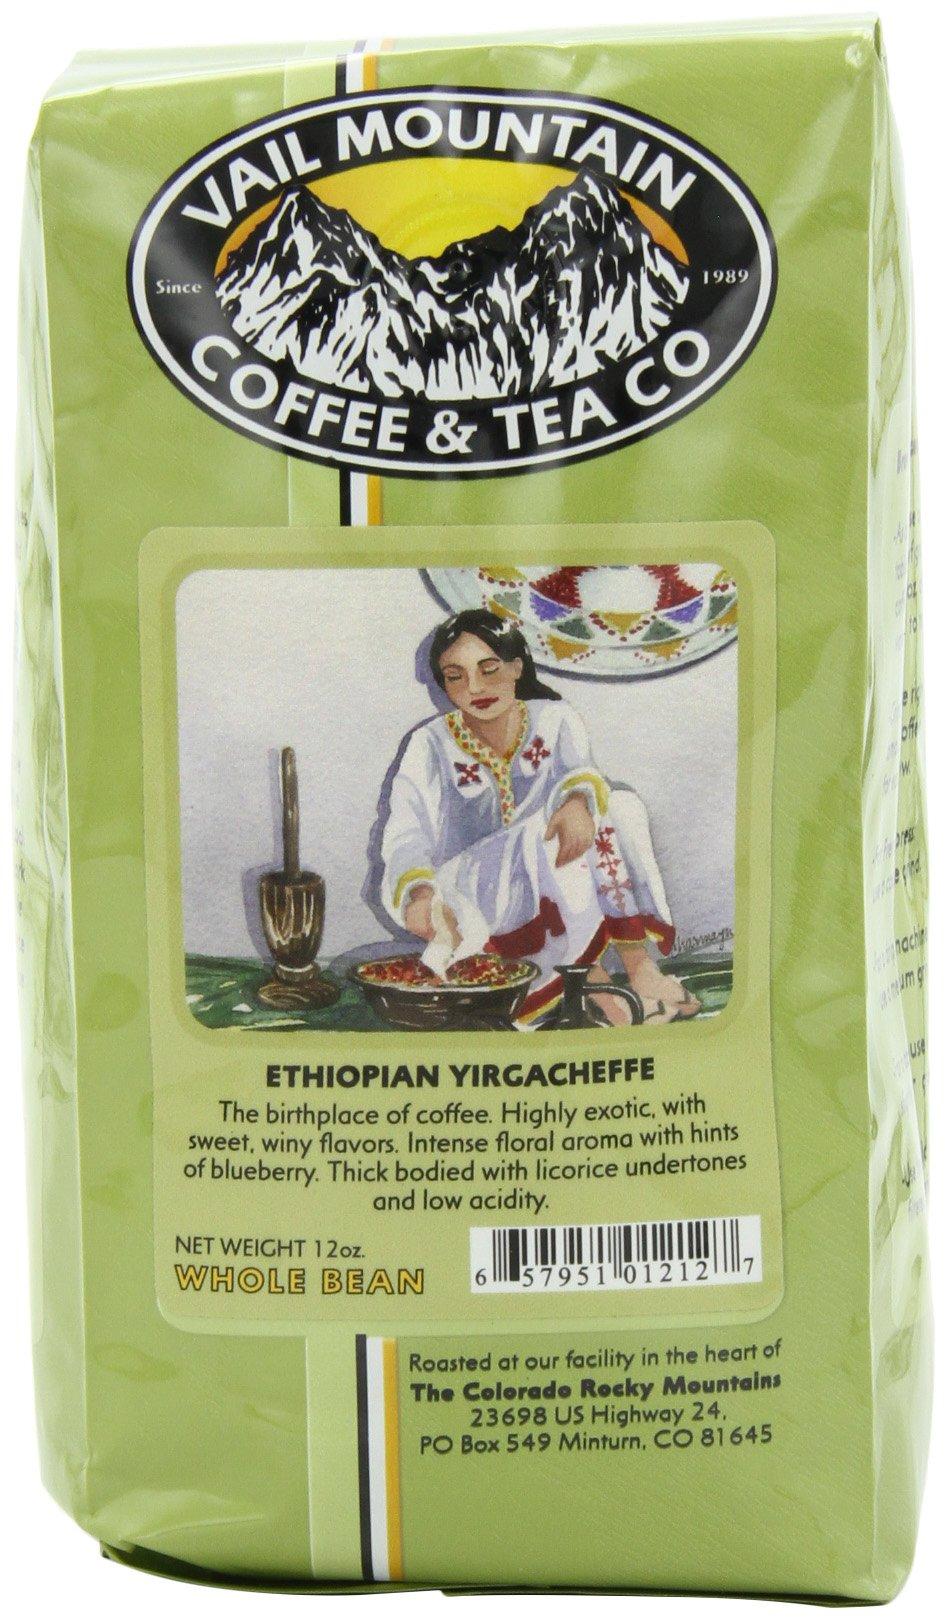 Vail Mountain Coffee & Tea Ethiopian Yirgacheffe Whole Bean Coffee, 12-Ounce Bags (Pack of 3) by Vail Mountain Coffee & Tea